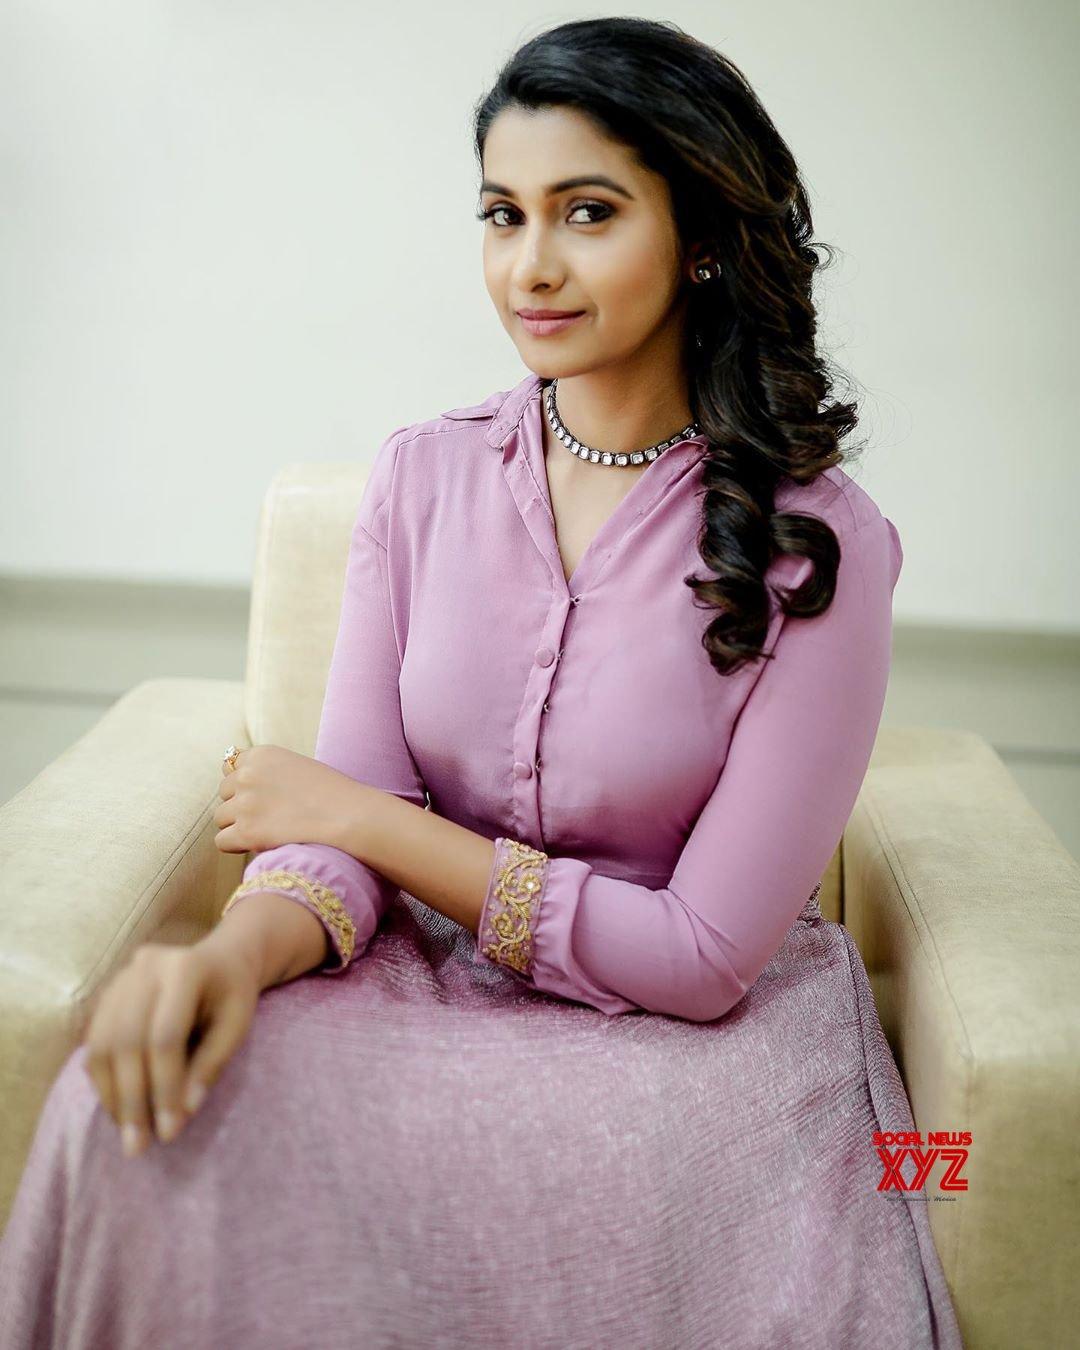 Actress Priya Bhavani Shankar New Glam Stills